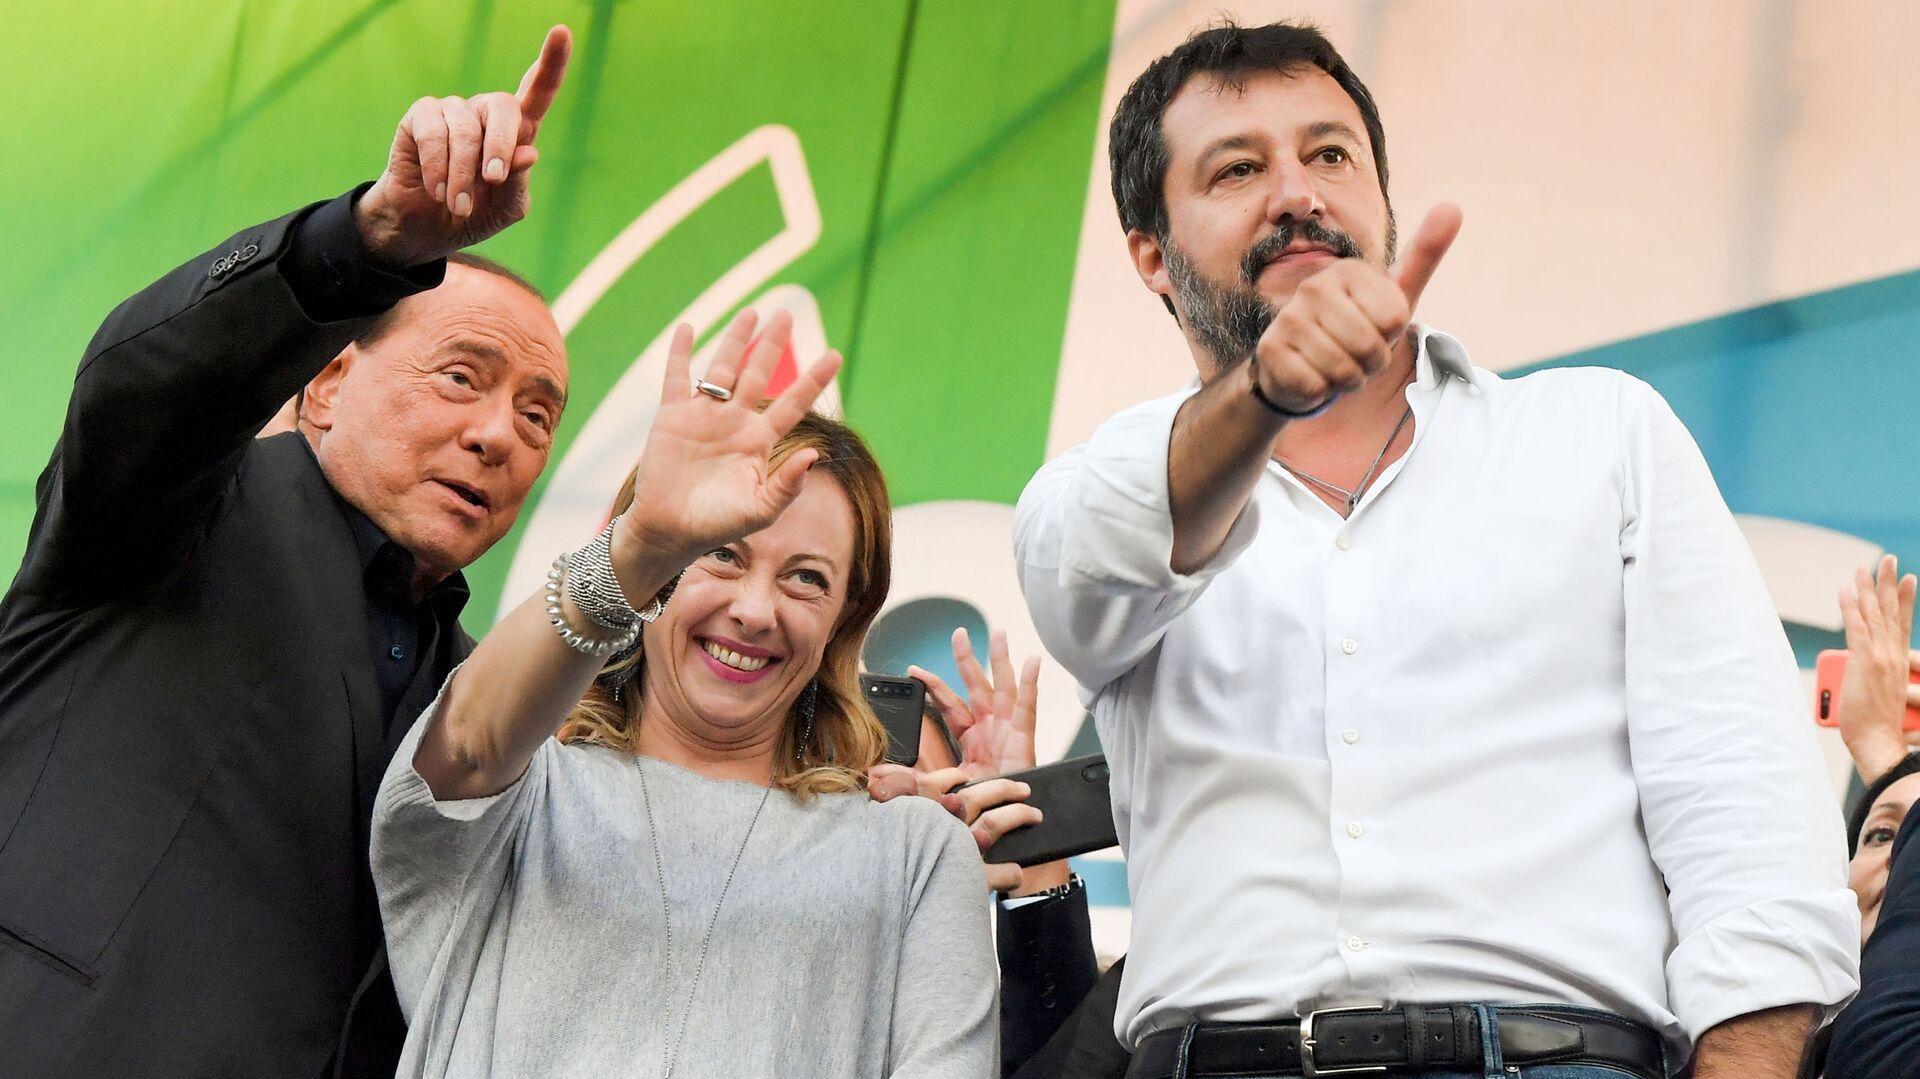 Silvio Berlusconi, Giorgia Meloni e Matteo Salvini - Sputnik Italia, 1920, 20.08.2021